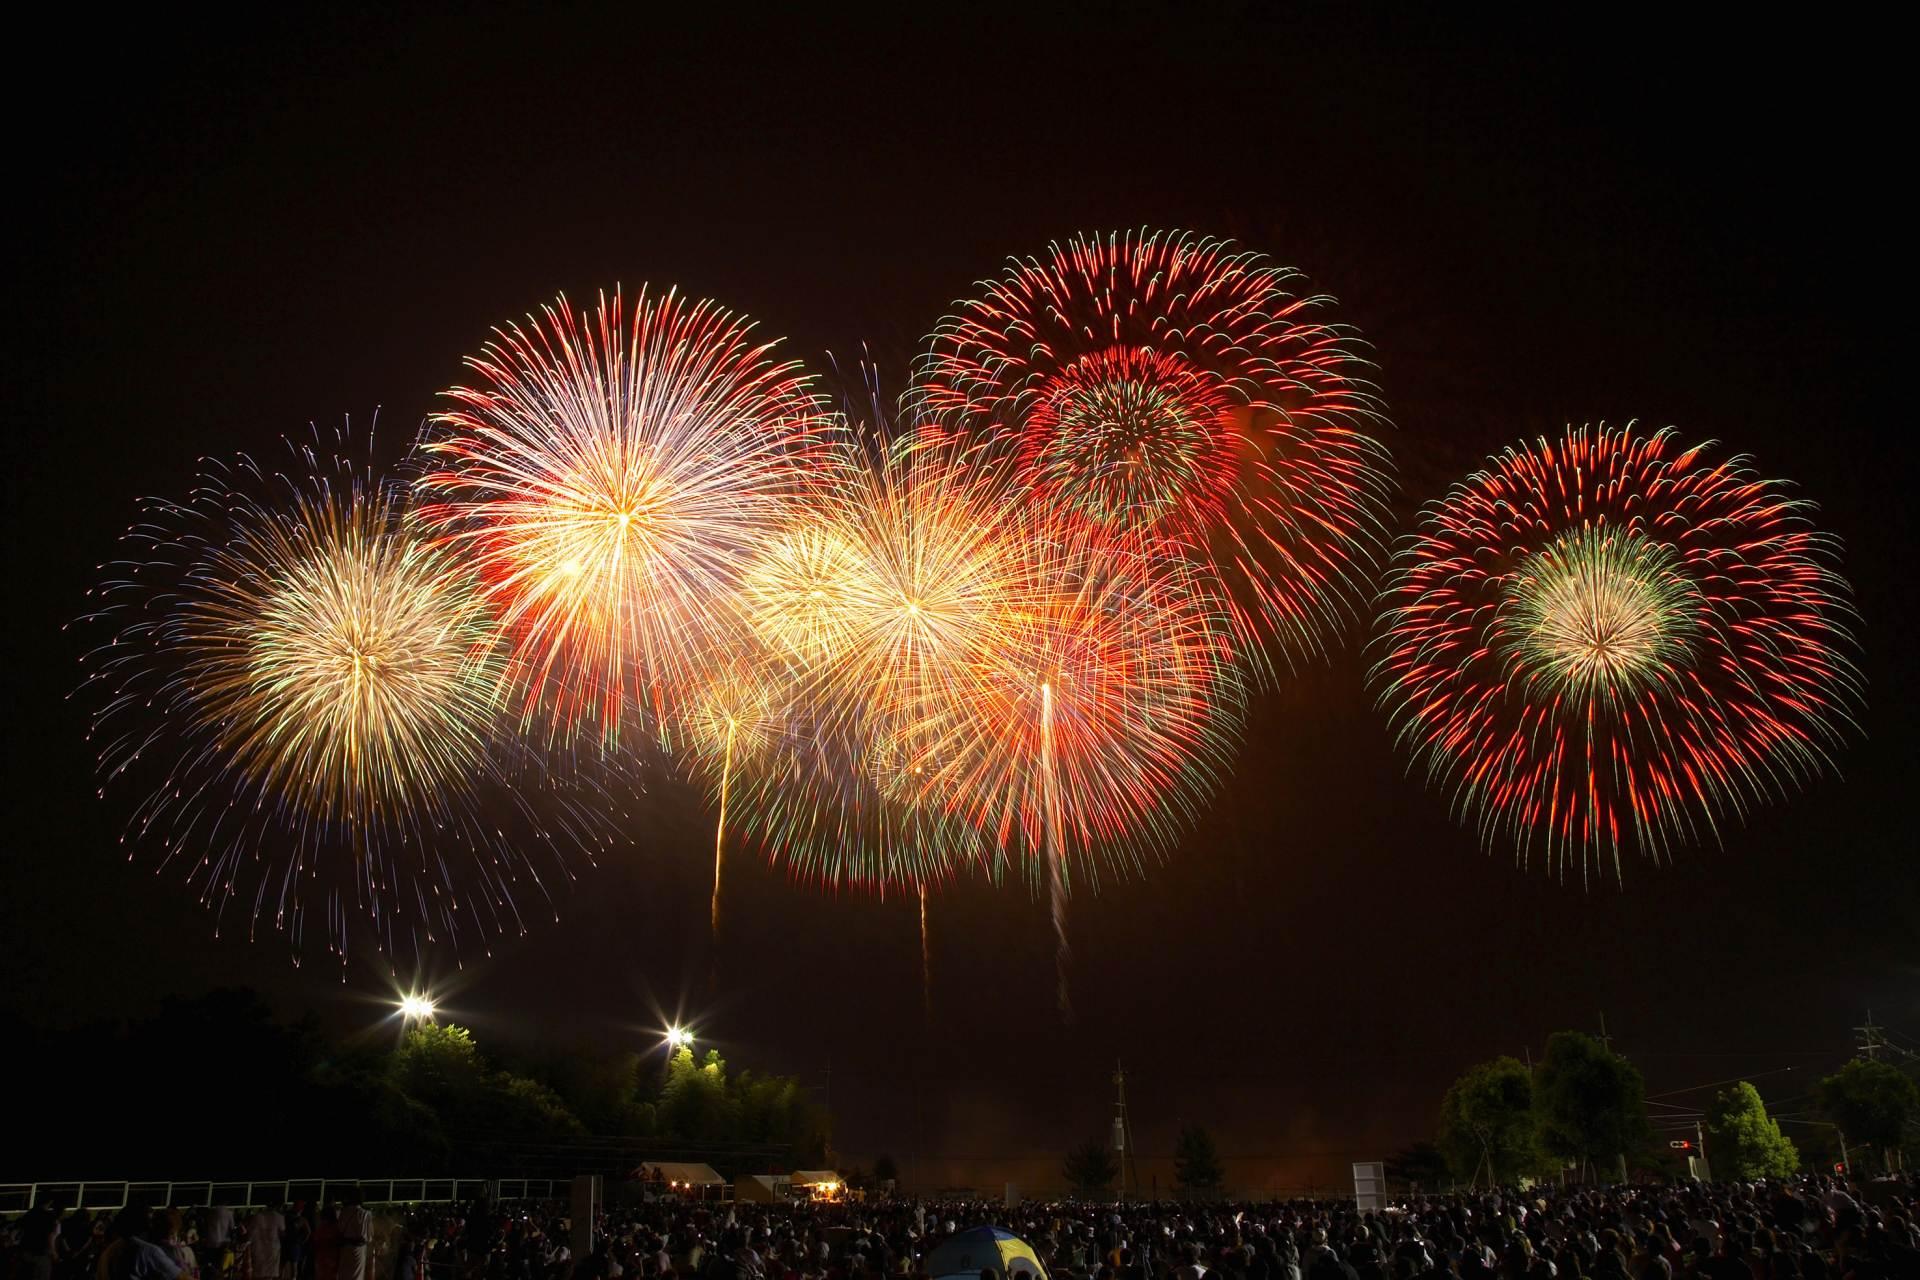 The 103rd Ashikaga Fireworks Festival